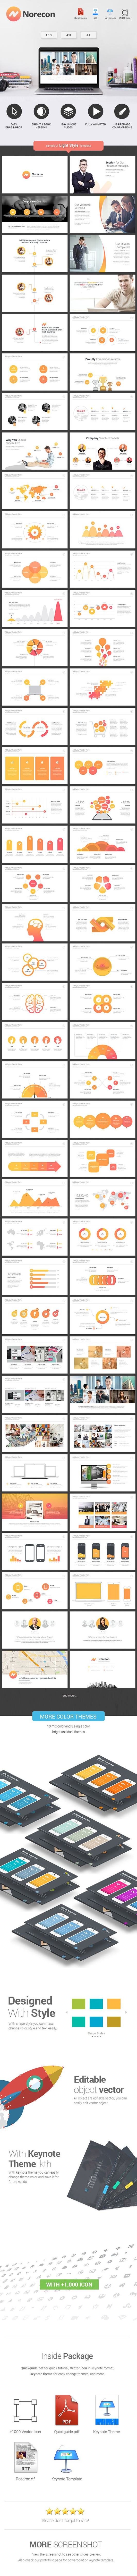 743 best ppt images on pinterest presentation templates layout norecon fresh keynote template deck designdesign webpresentation designwebsite baanklon Choice Image